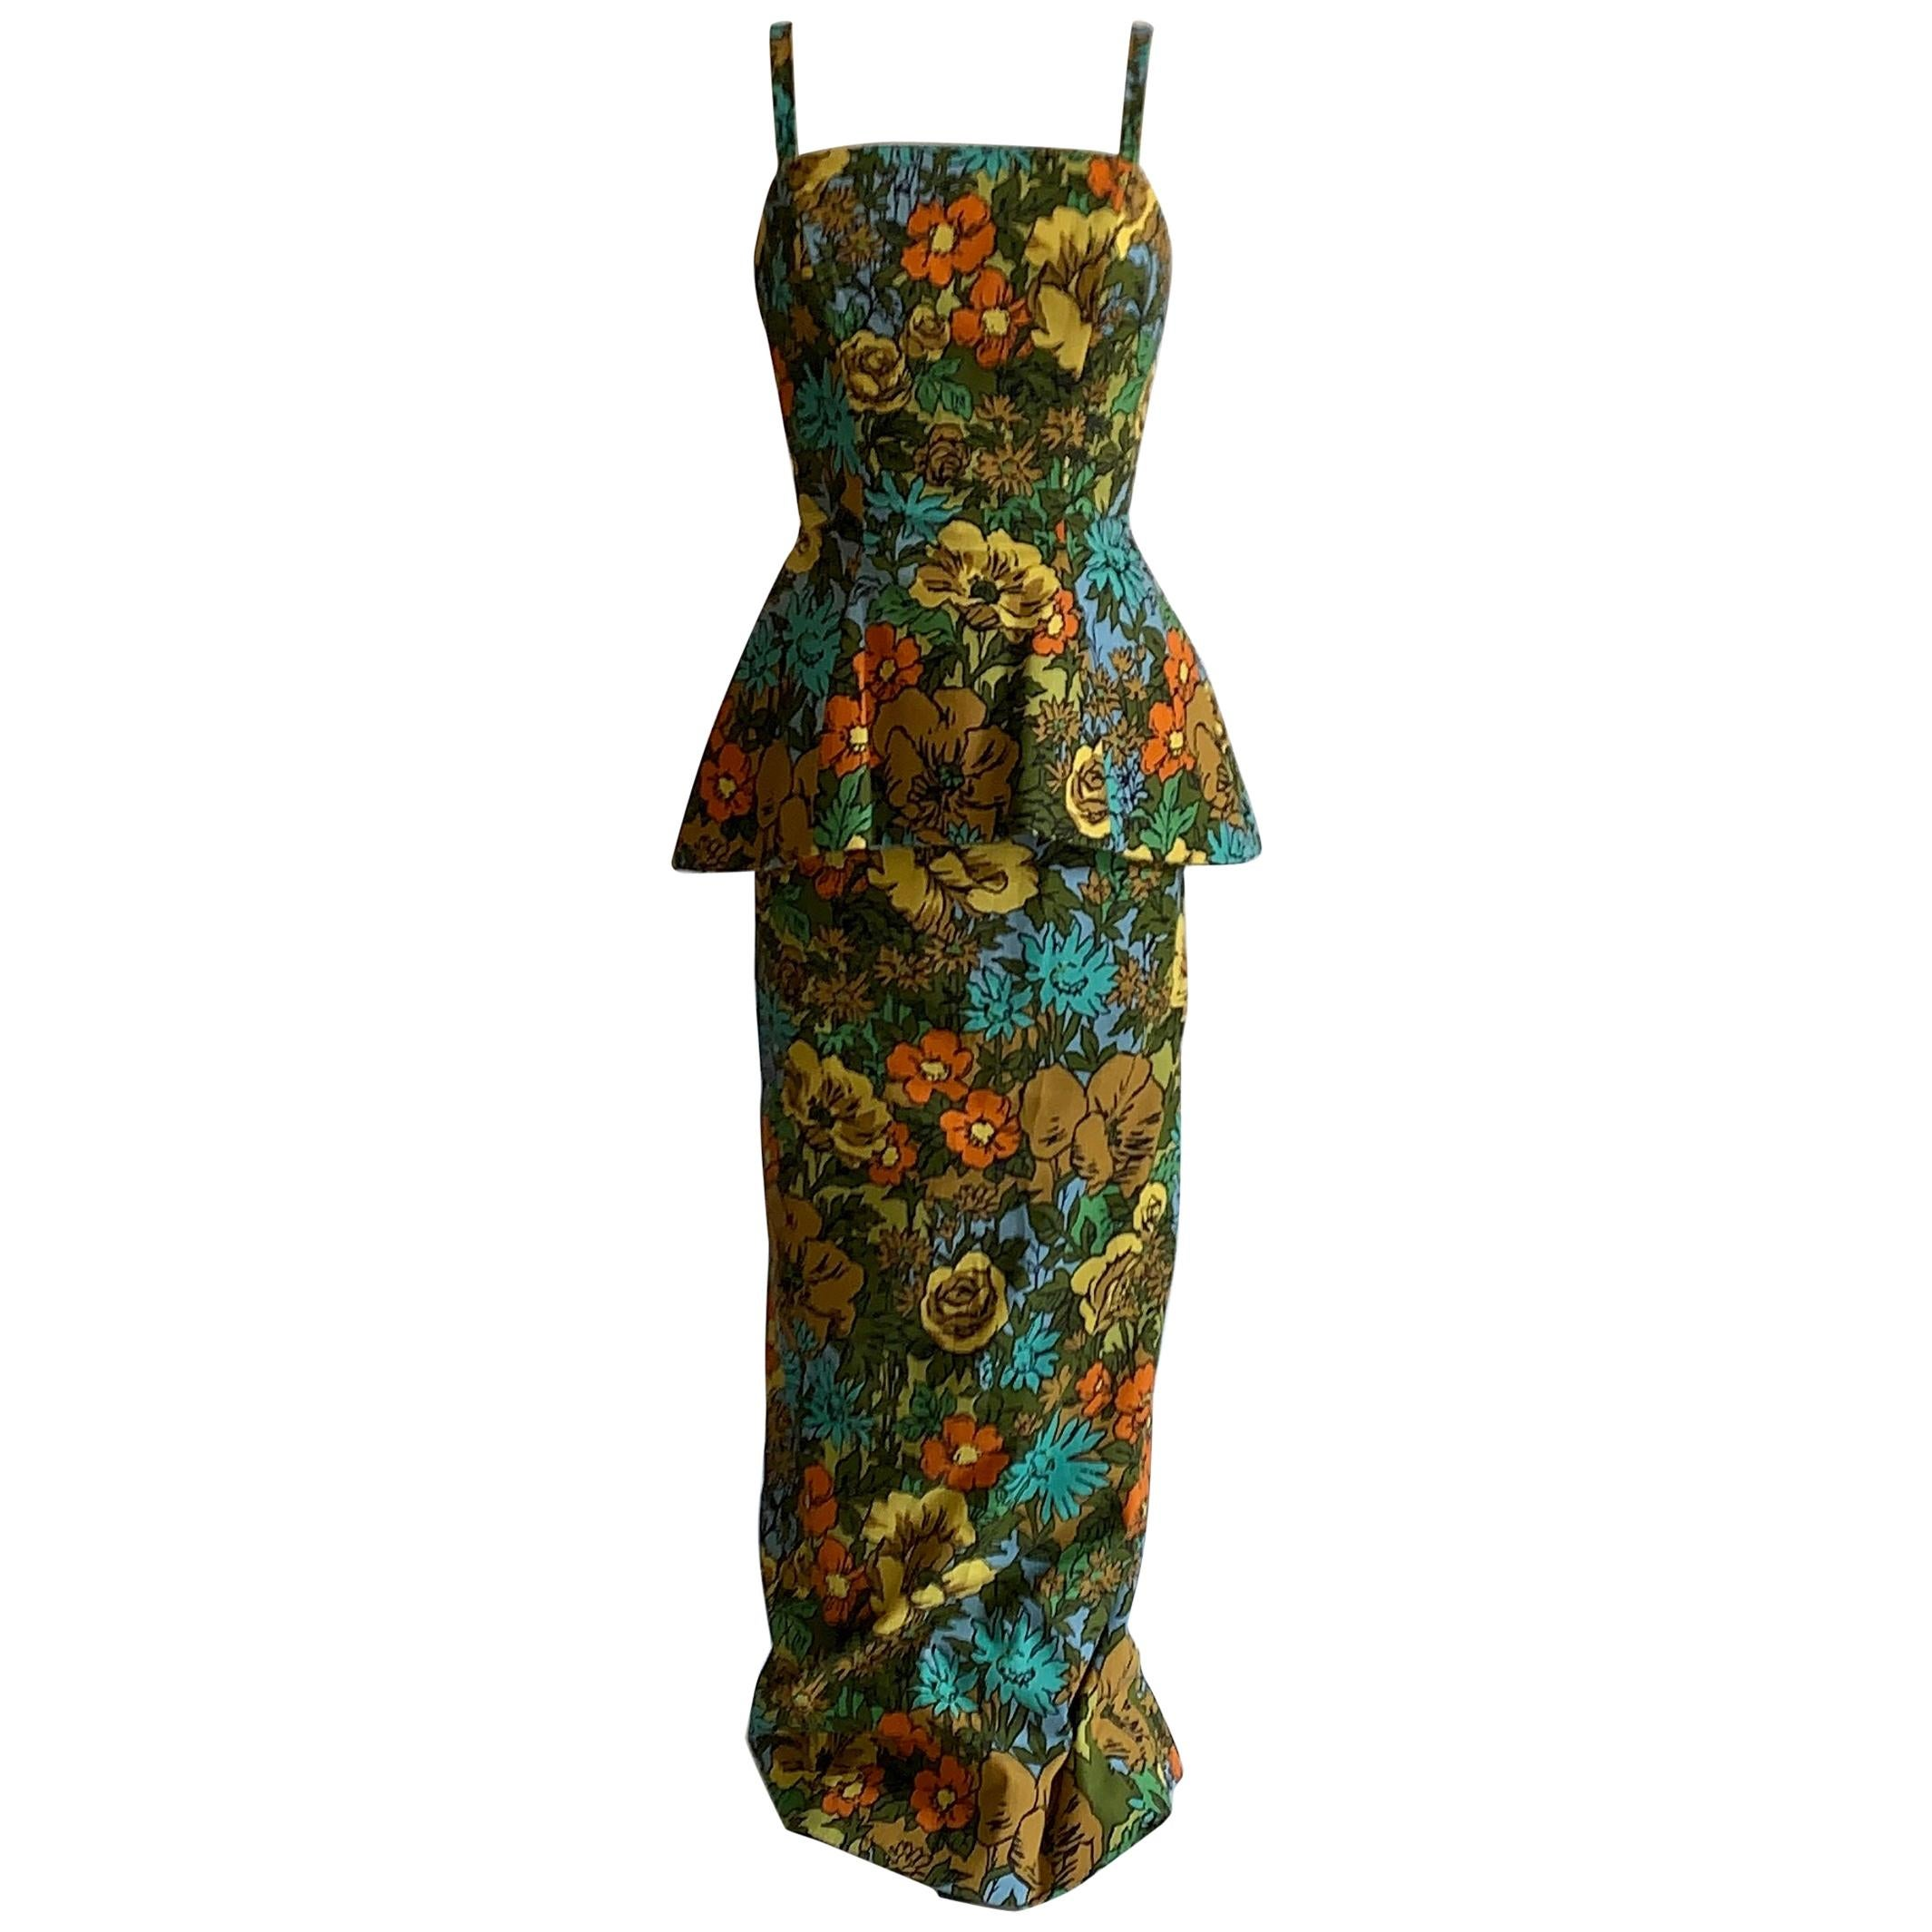 1960s Mr. Blackwell Custom Floral Dress, Yellow, Brown, Green, Blue Peplum Maxi